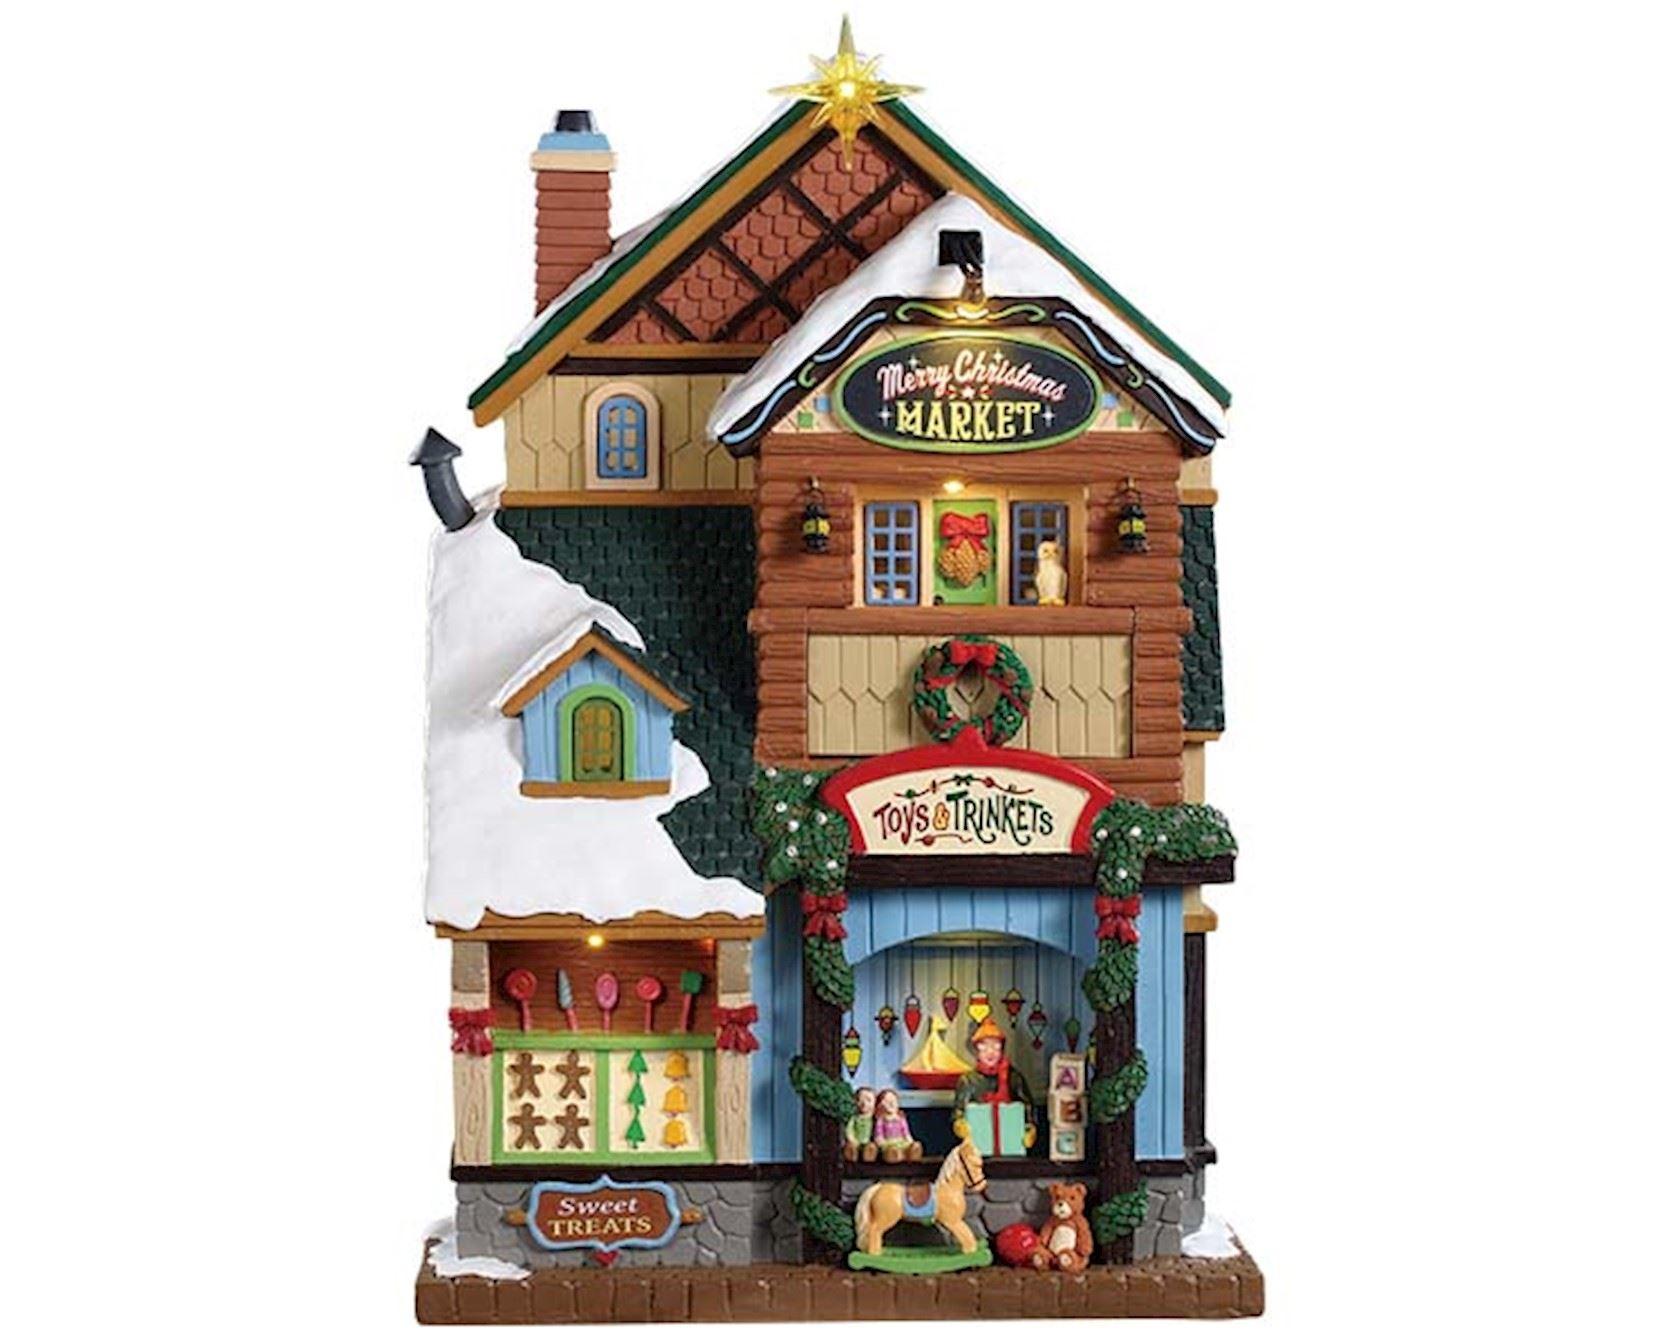 merry-christmas-market